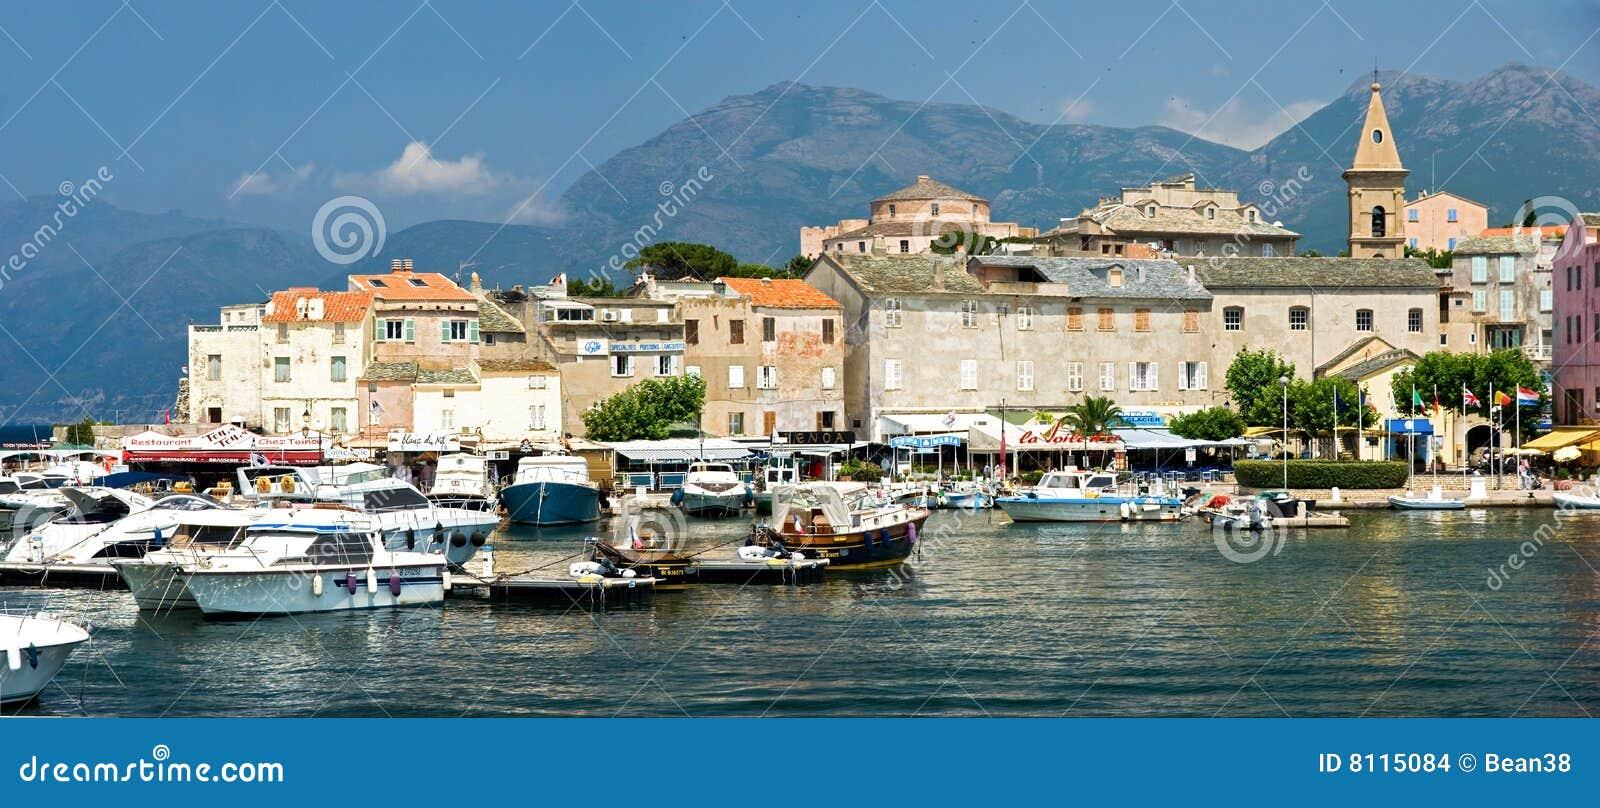 Corsica village (France)